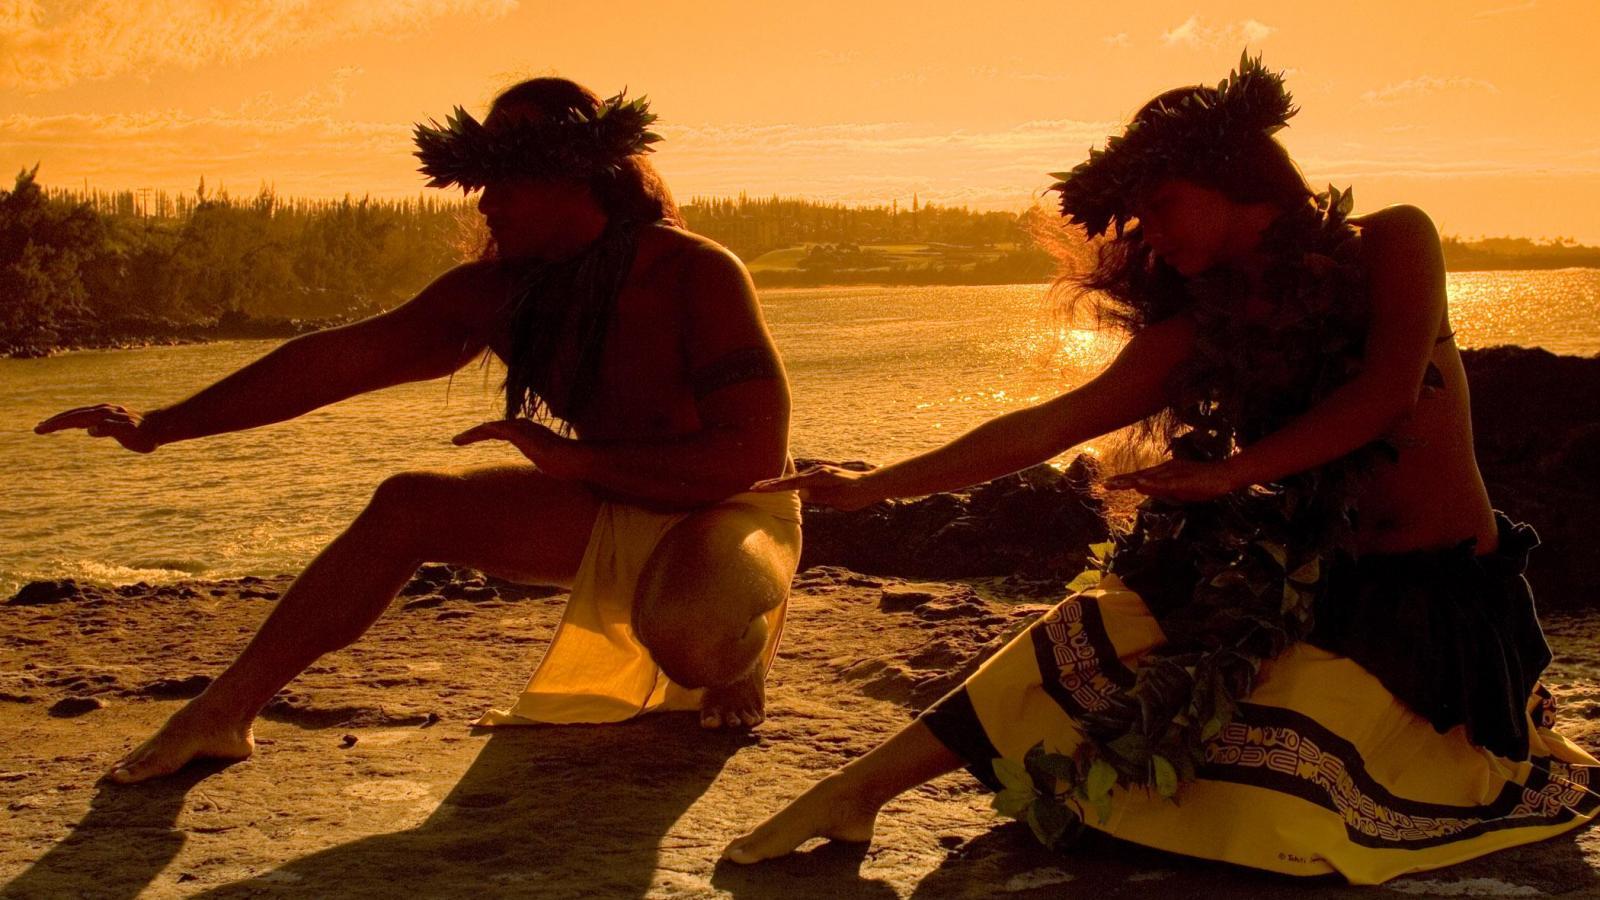 Hawaiian dancers on beach at sunset hawaii HQ WALLPAPER   130757 1600x900